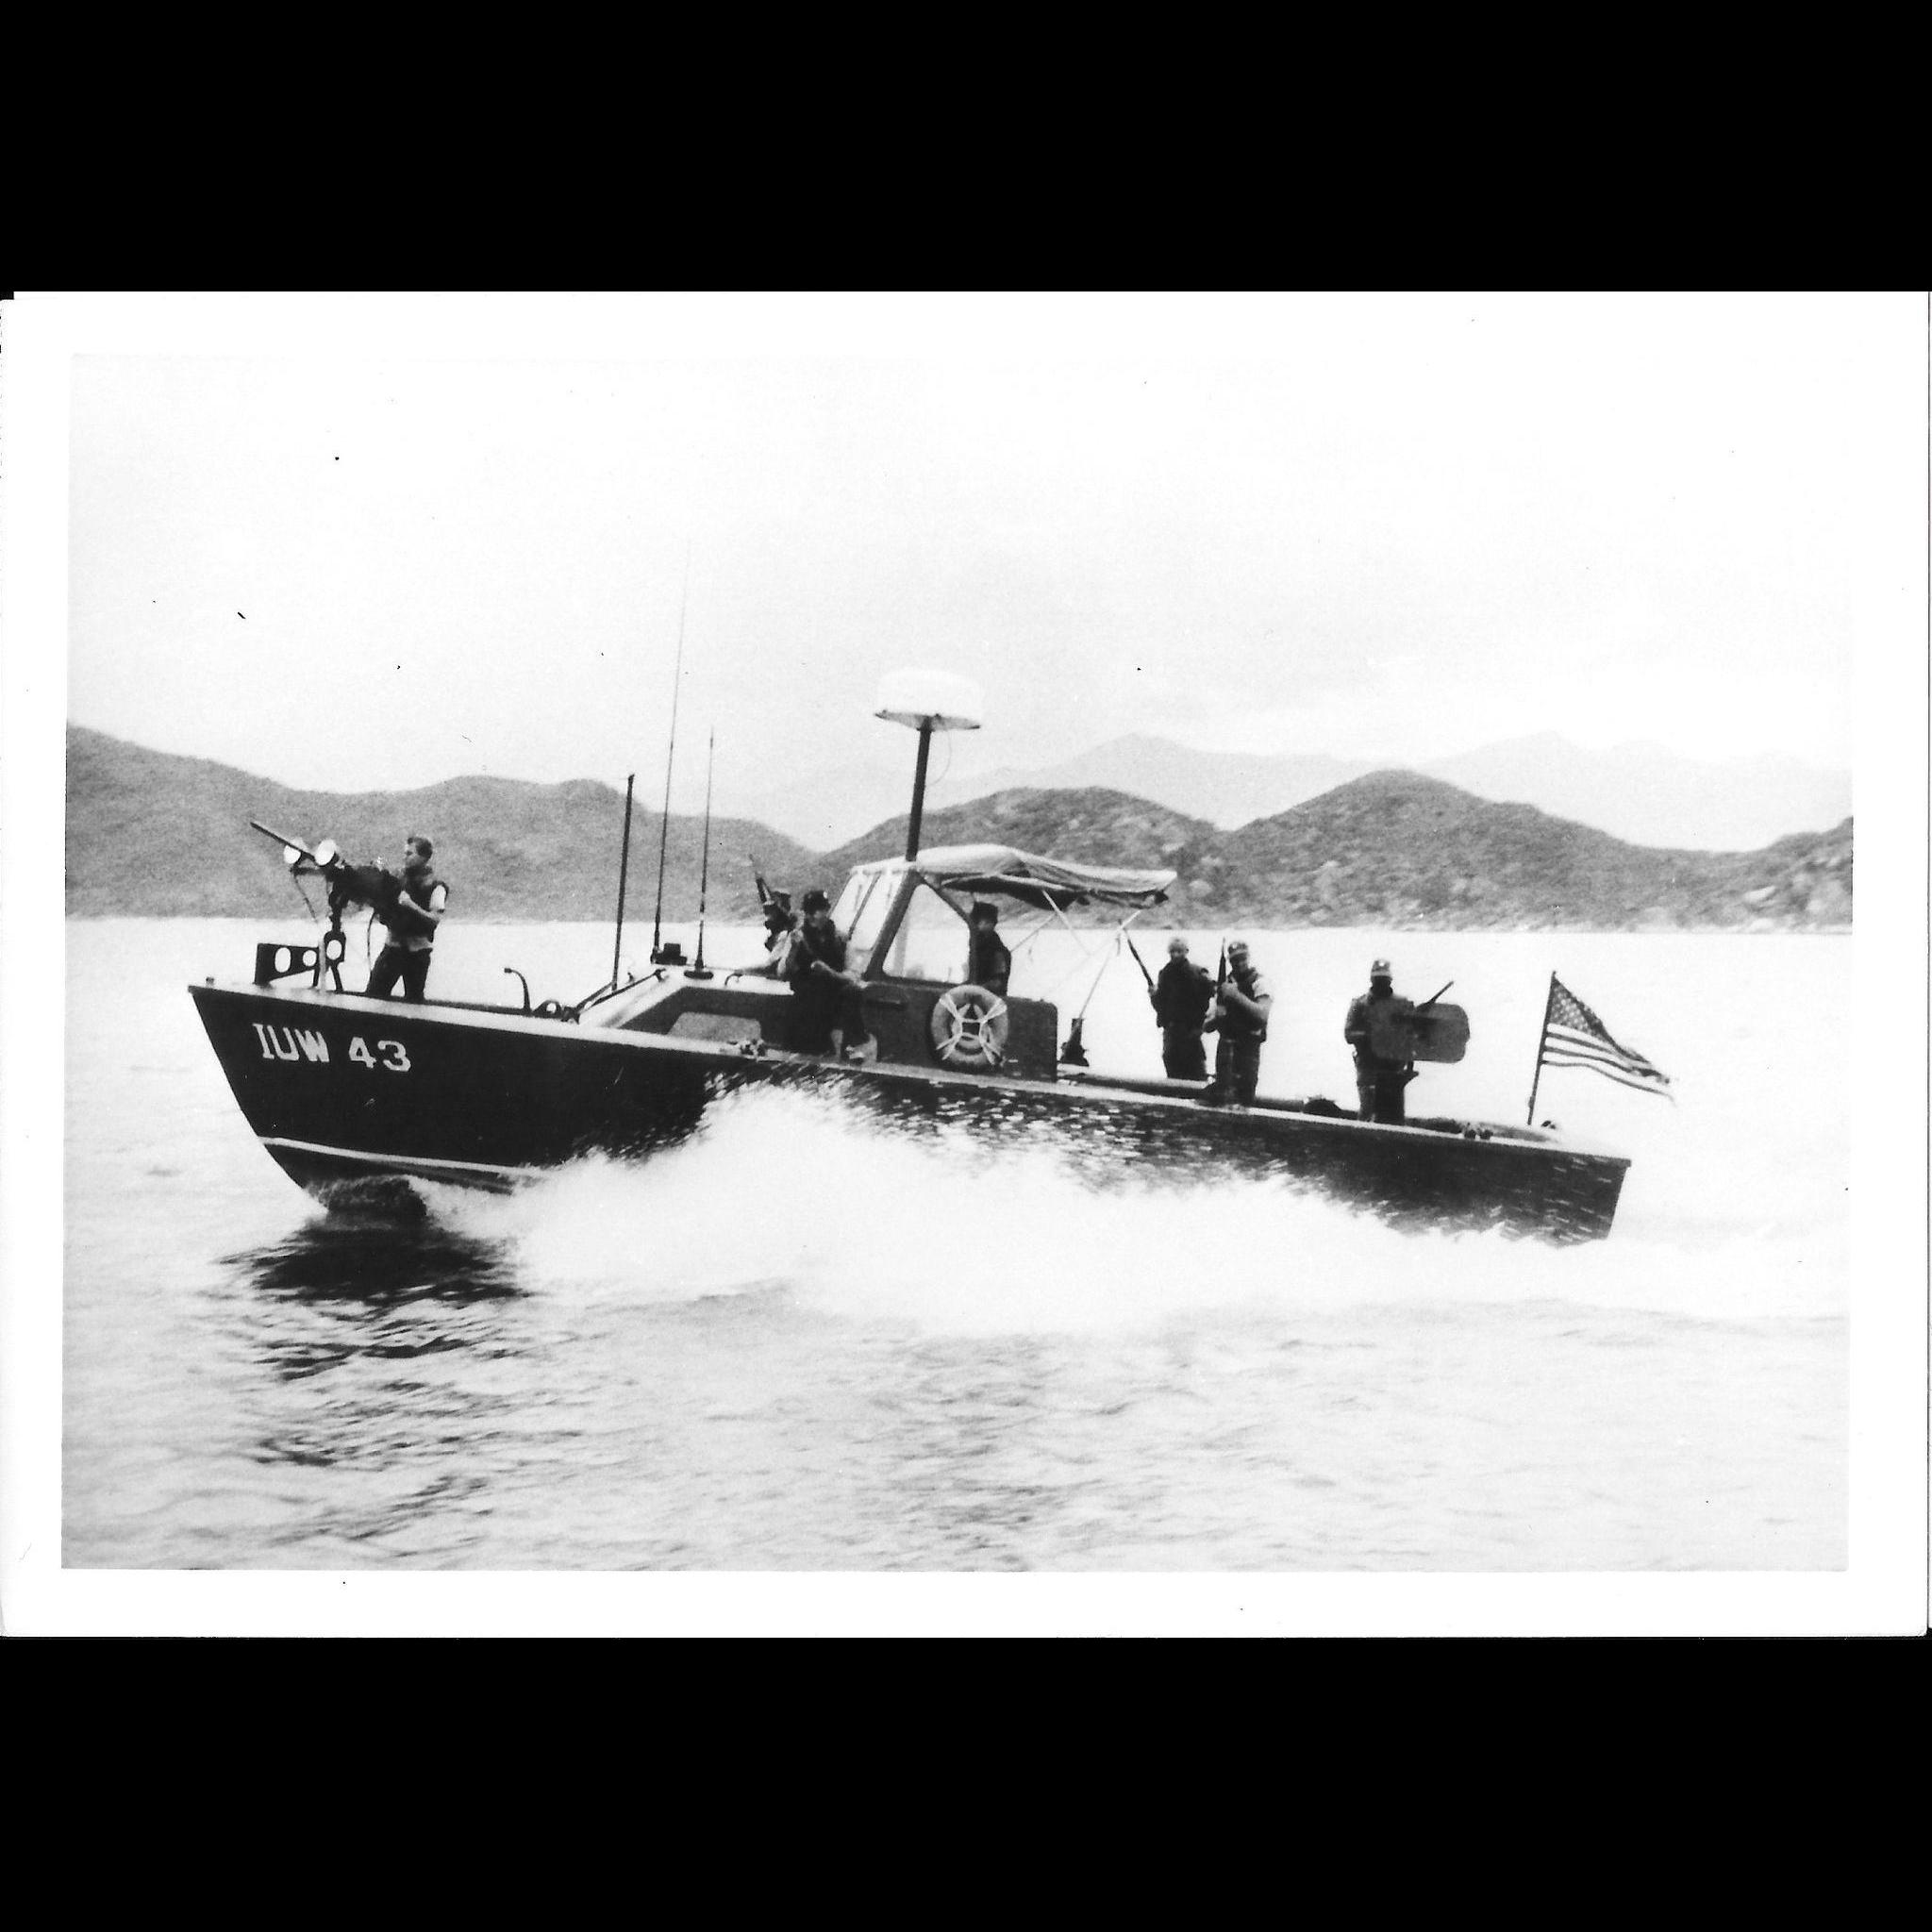 Vintage Photo Brown Water Navy Vietnam War Era Swift Boat Original Photograph